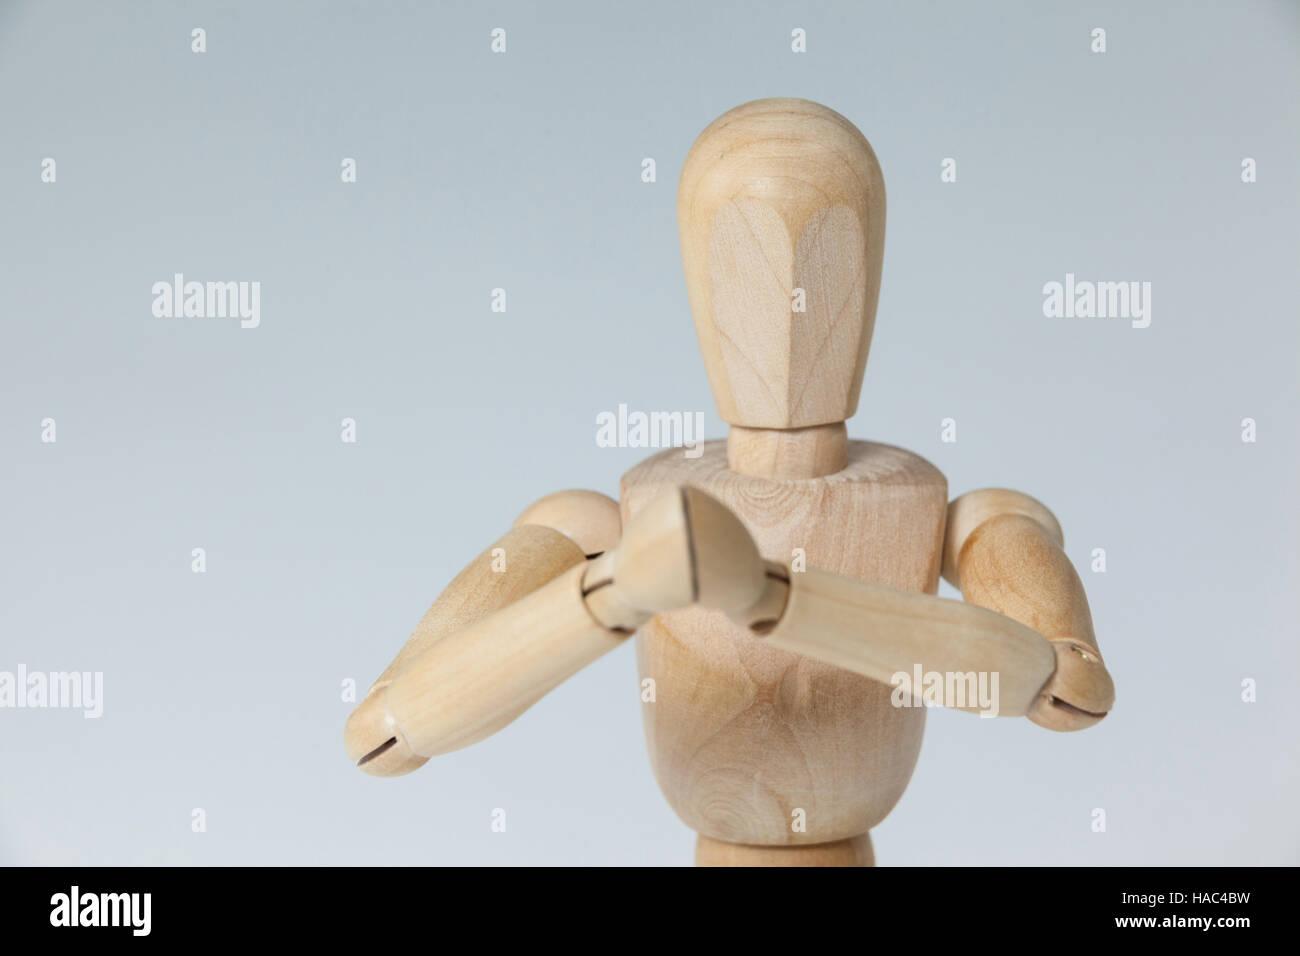 Figurilla de madera con ambas manos se unió a Imagen De Stock